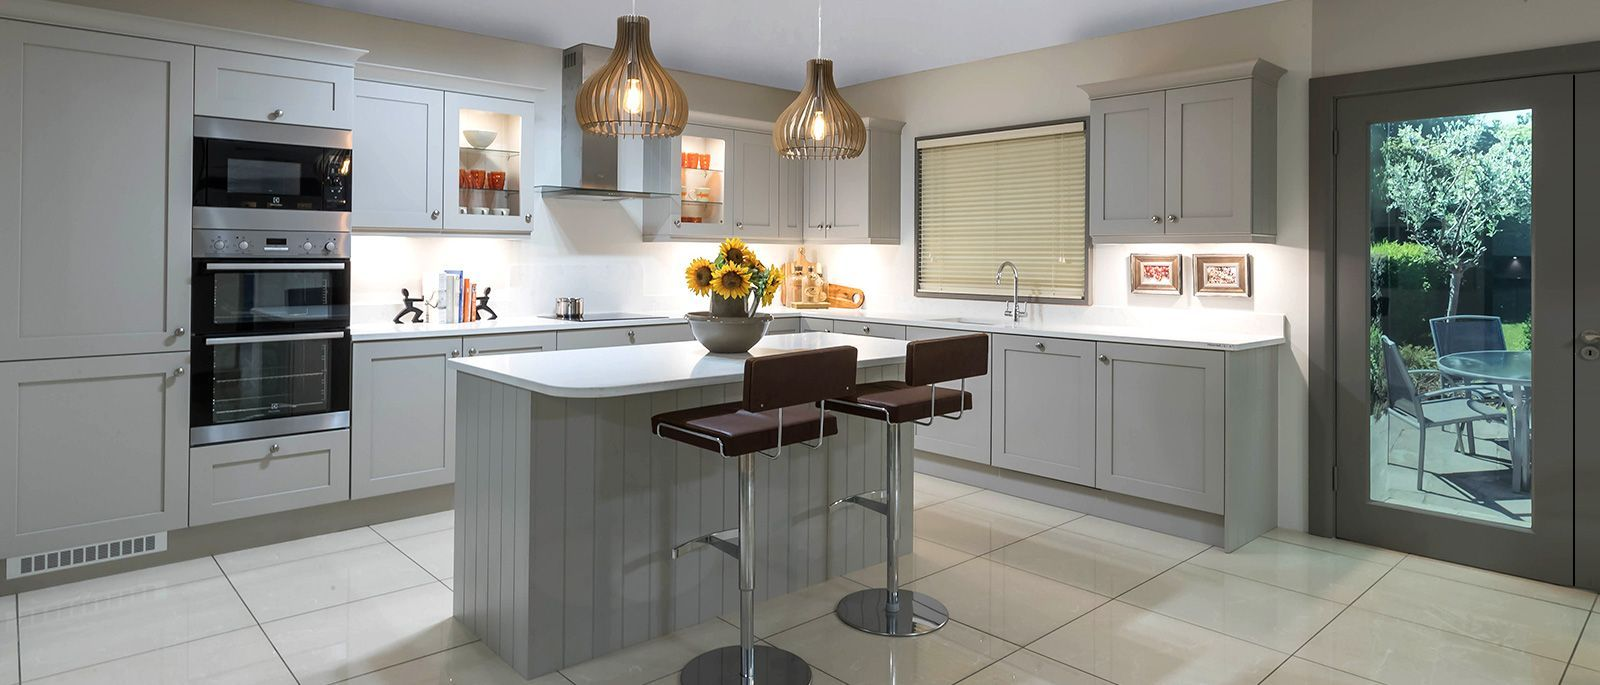 Image result for irish kitchen design ideas Irish